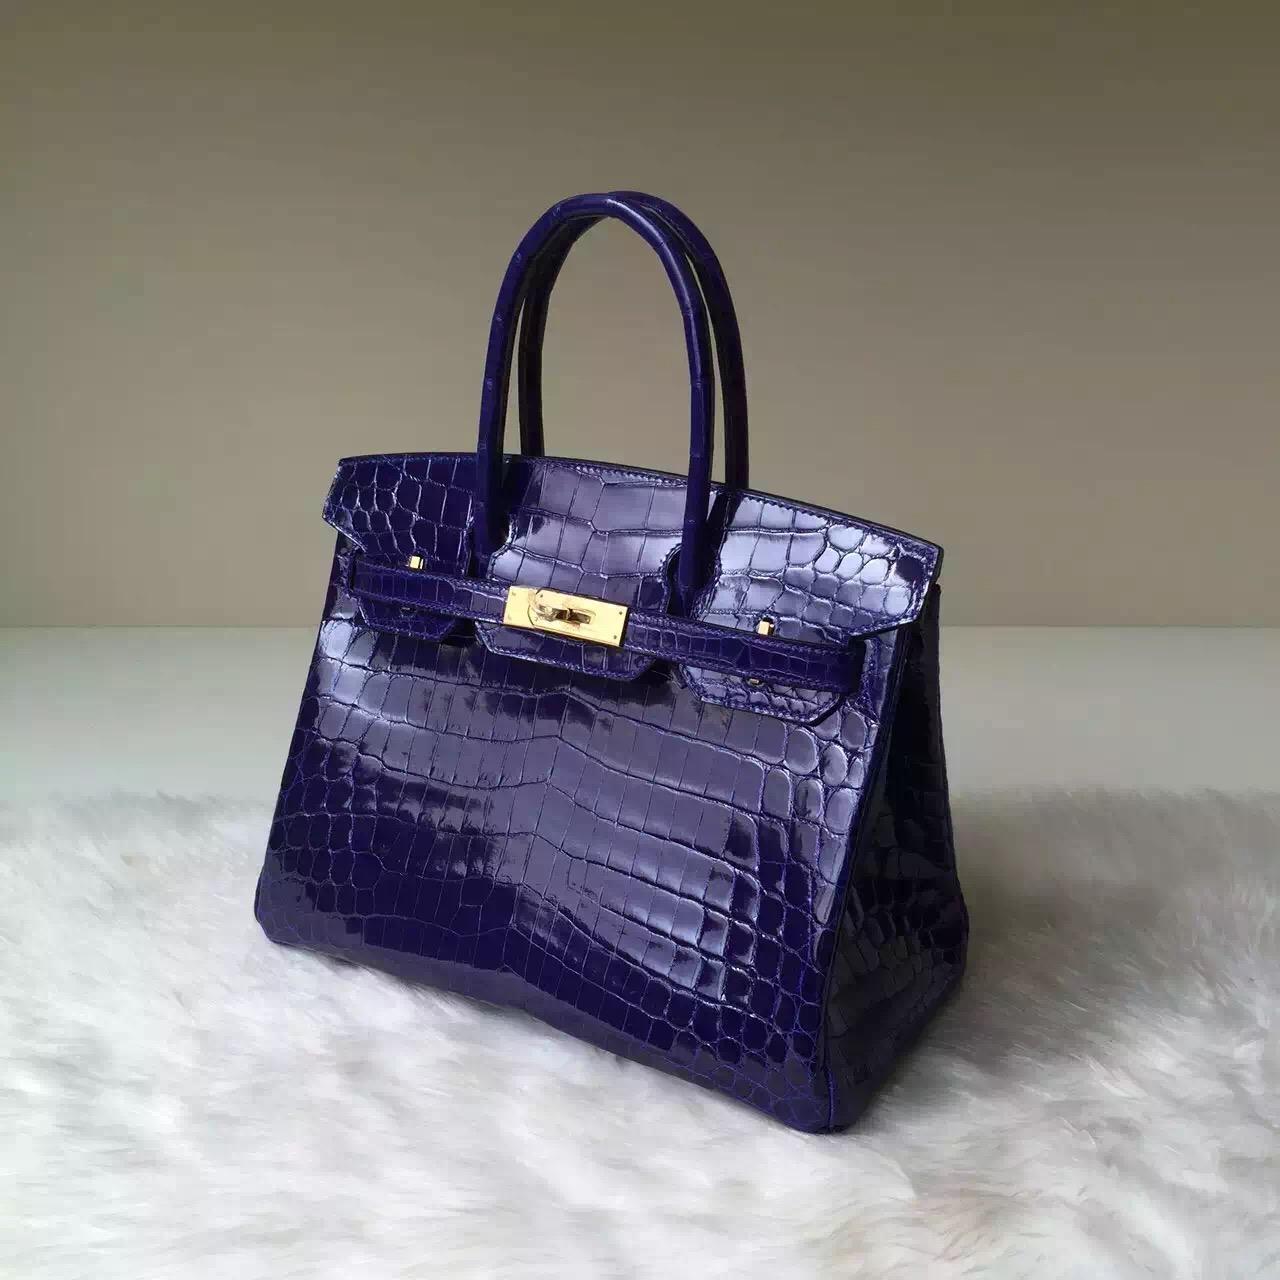 Wholesale Hermes Crocodile Shiny Leather Birkin30 in 7T Blue Electric